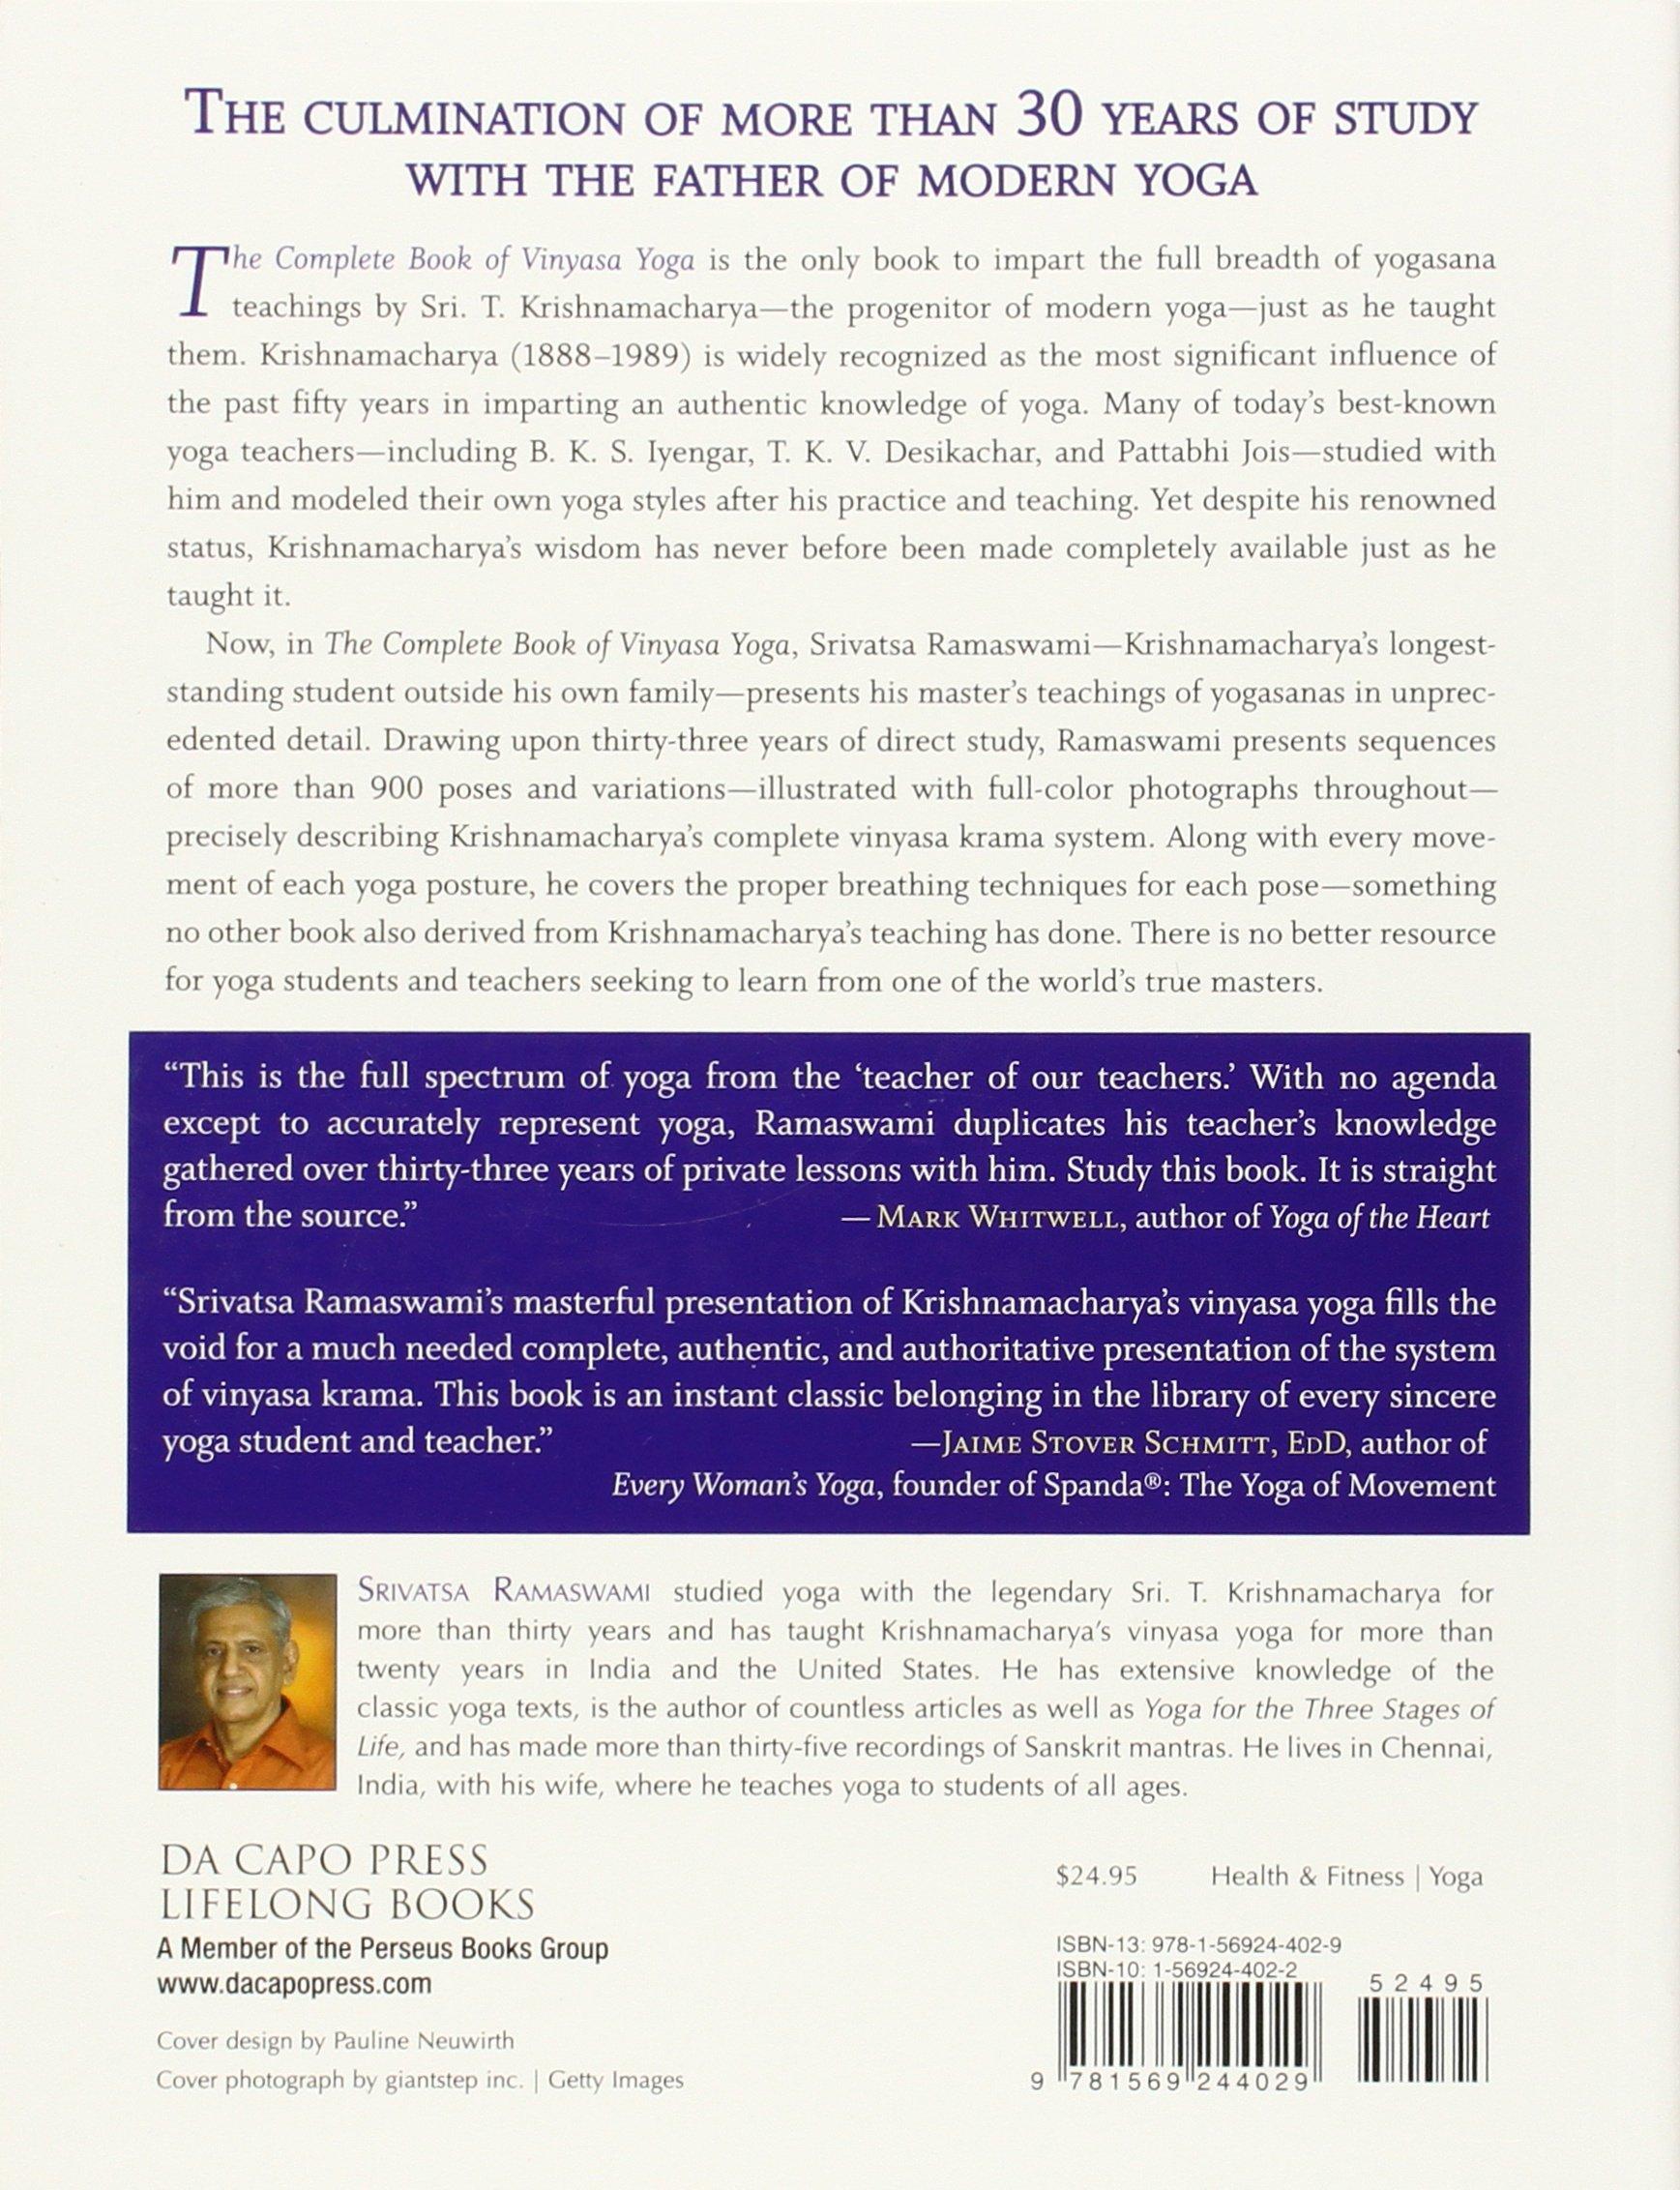 The Complete Book of Vinyasa Yoga: The Authoritative ...